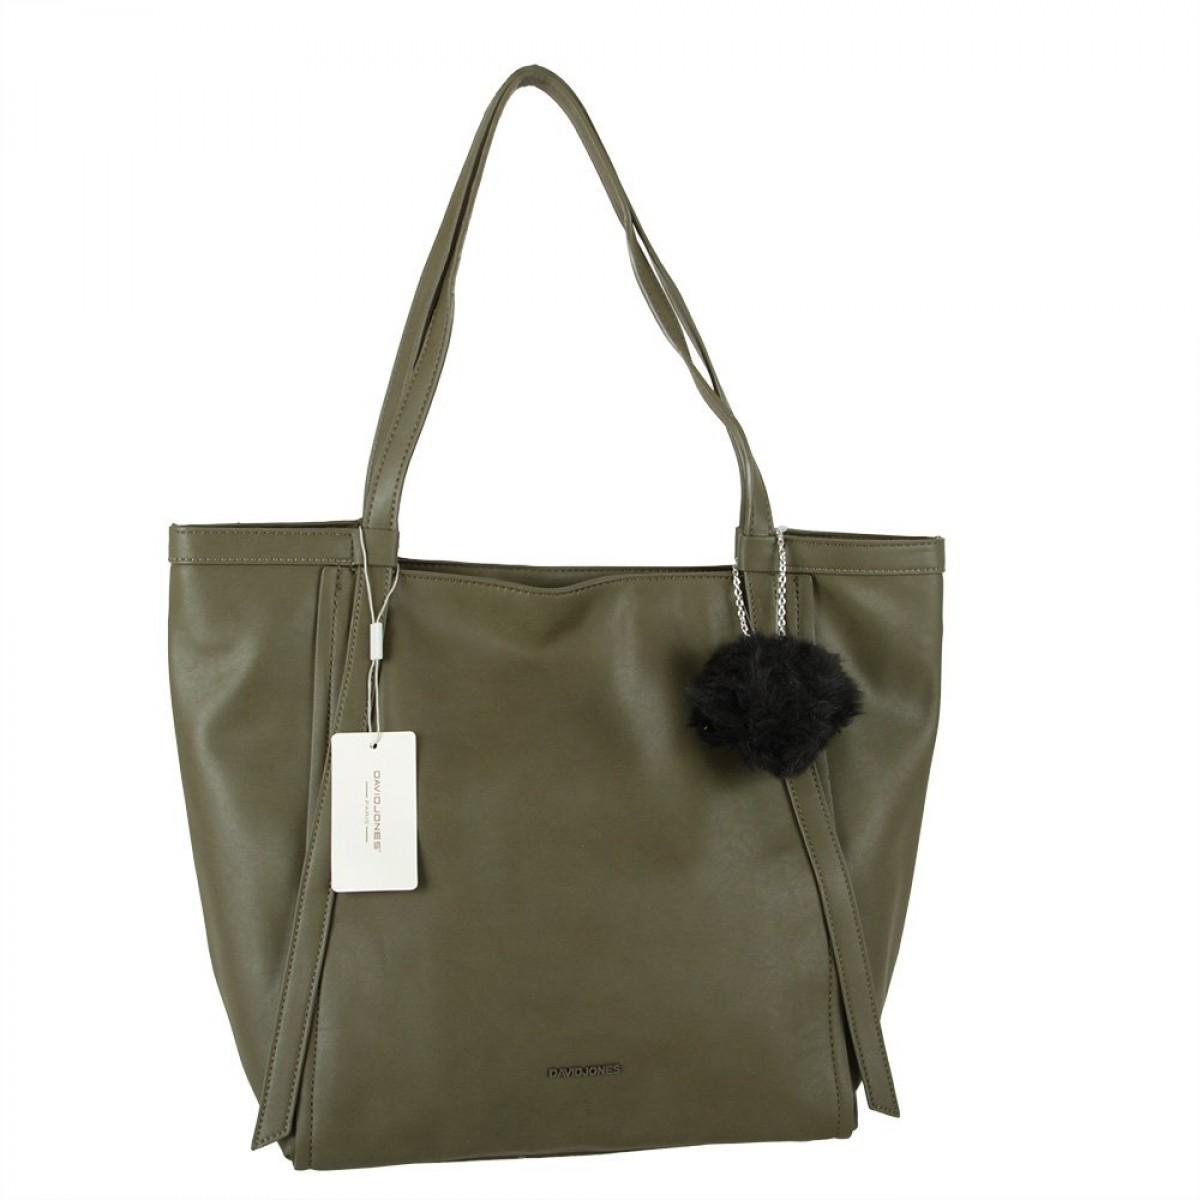 Жіноча сумка David Jones CM5856 VERT